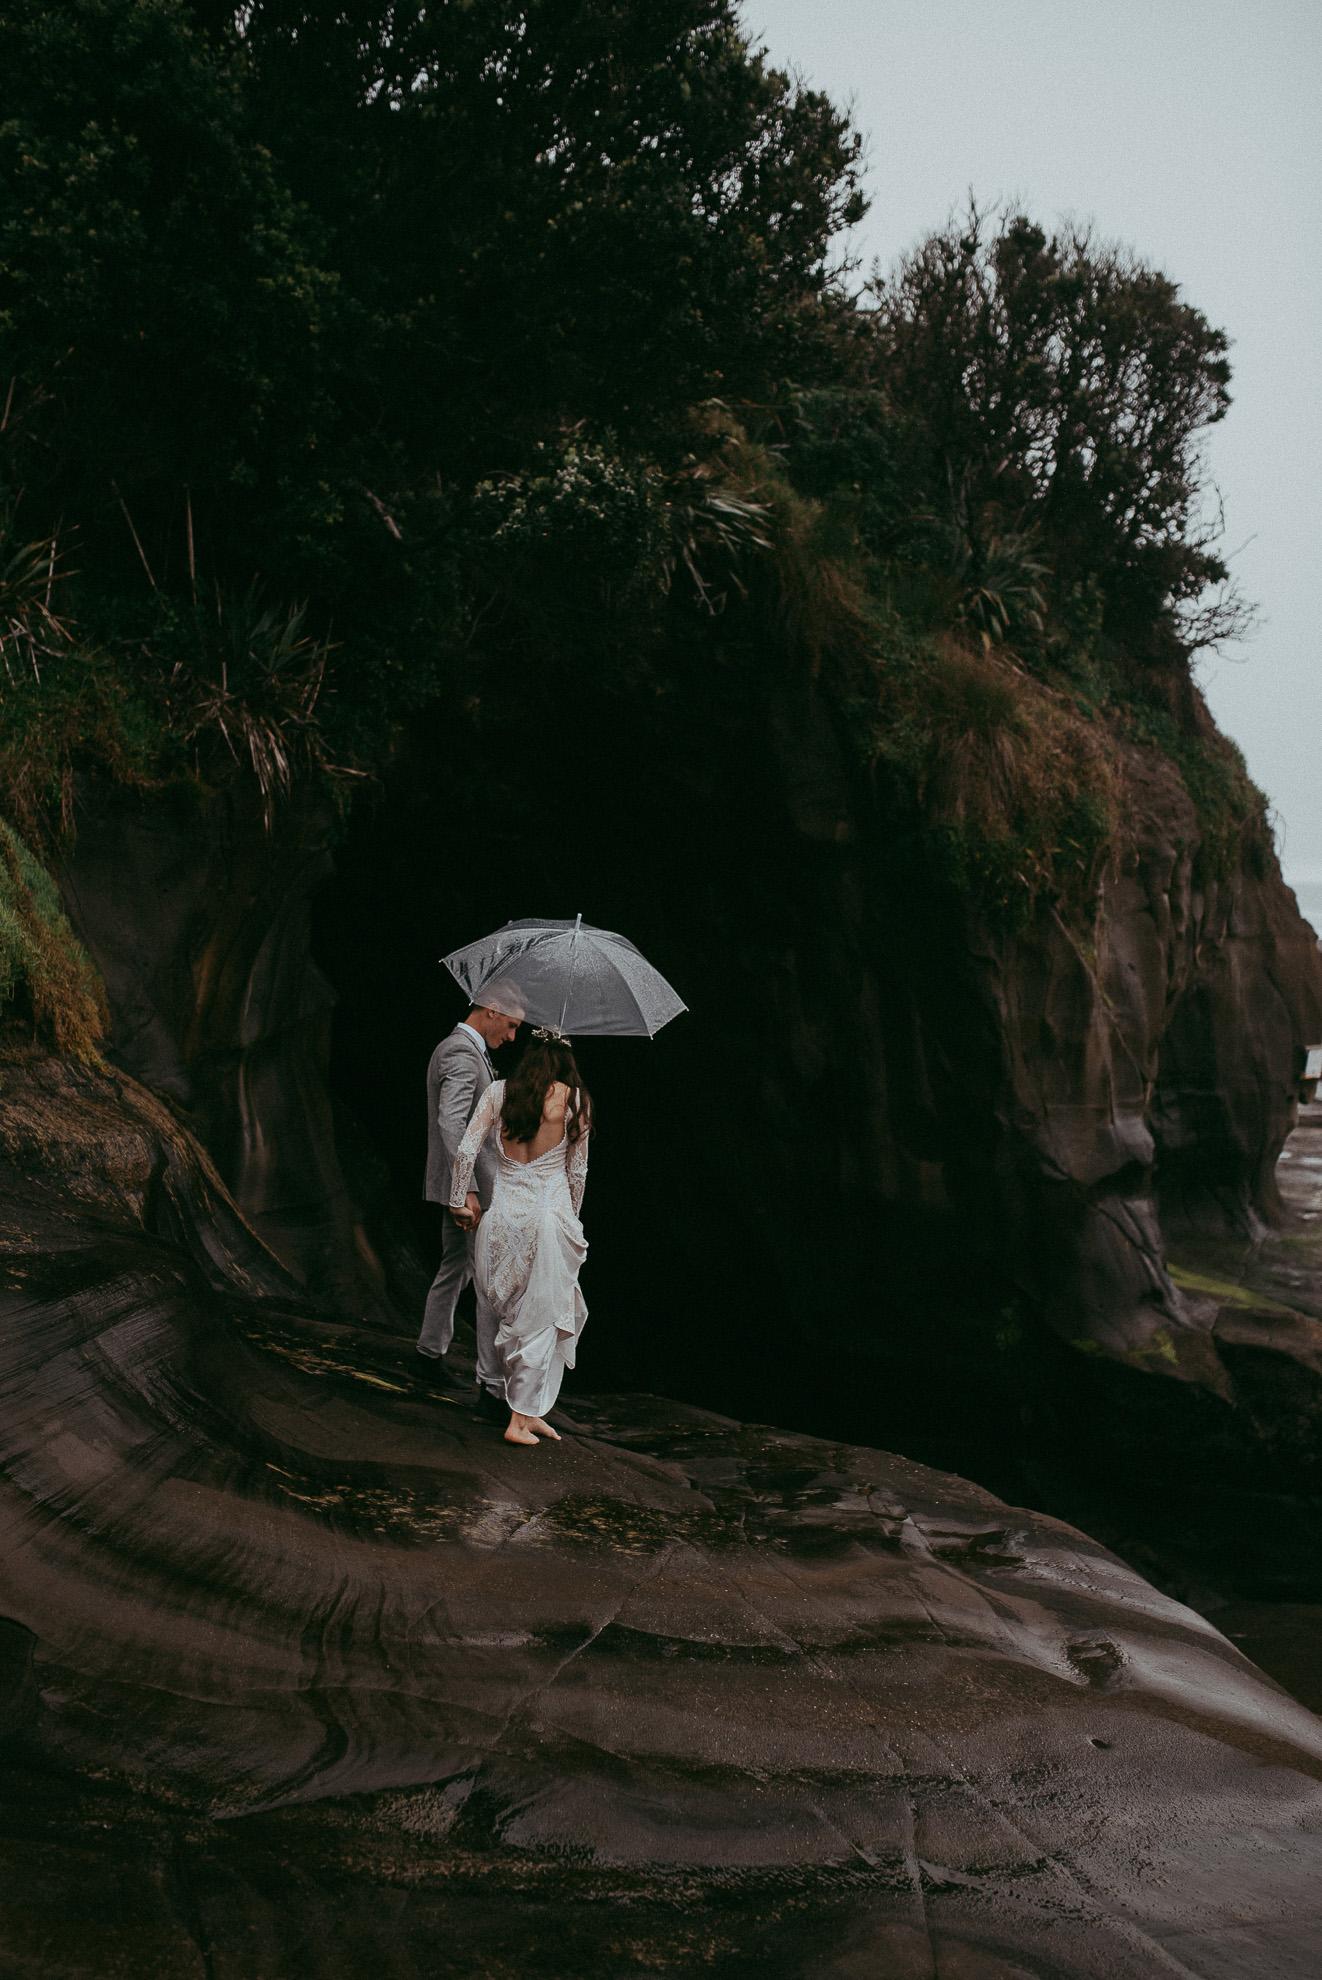 Muriwai beach bride and groom photo shoot {West Auckland wedding photographer}